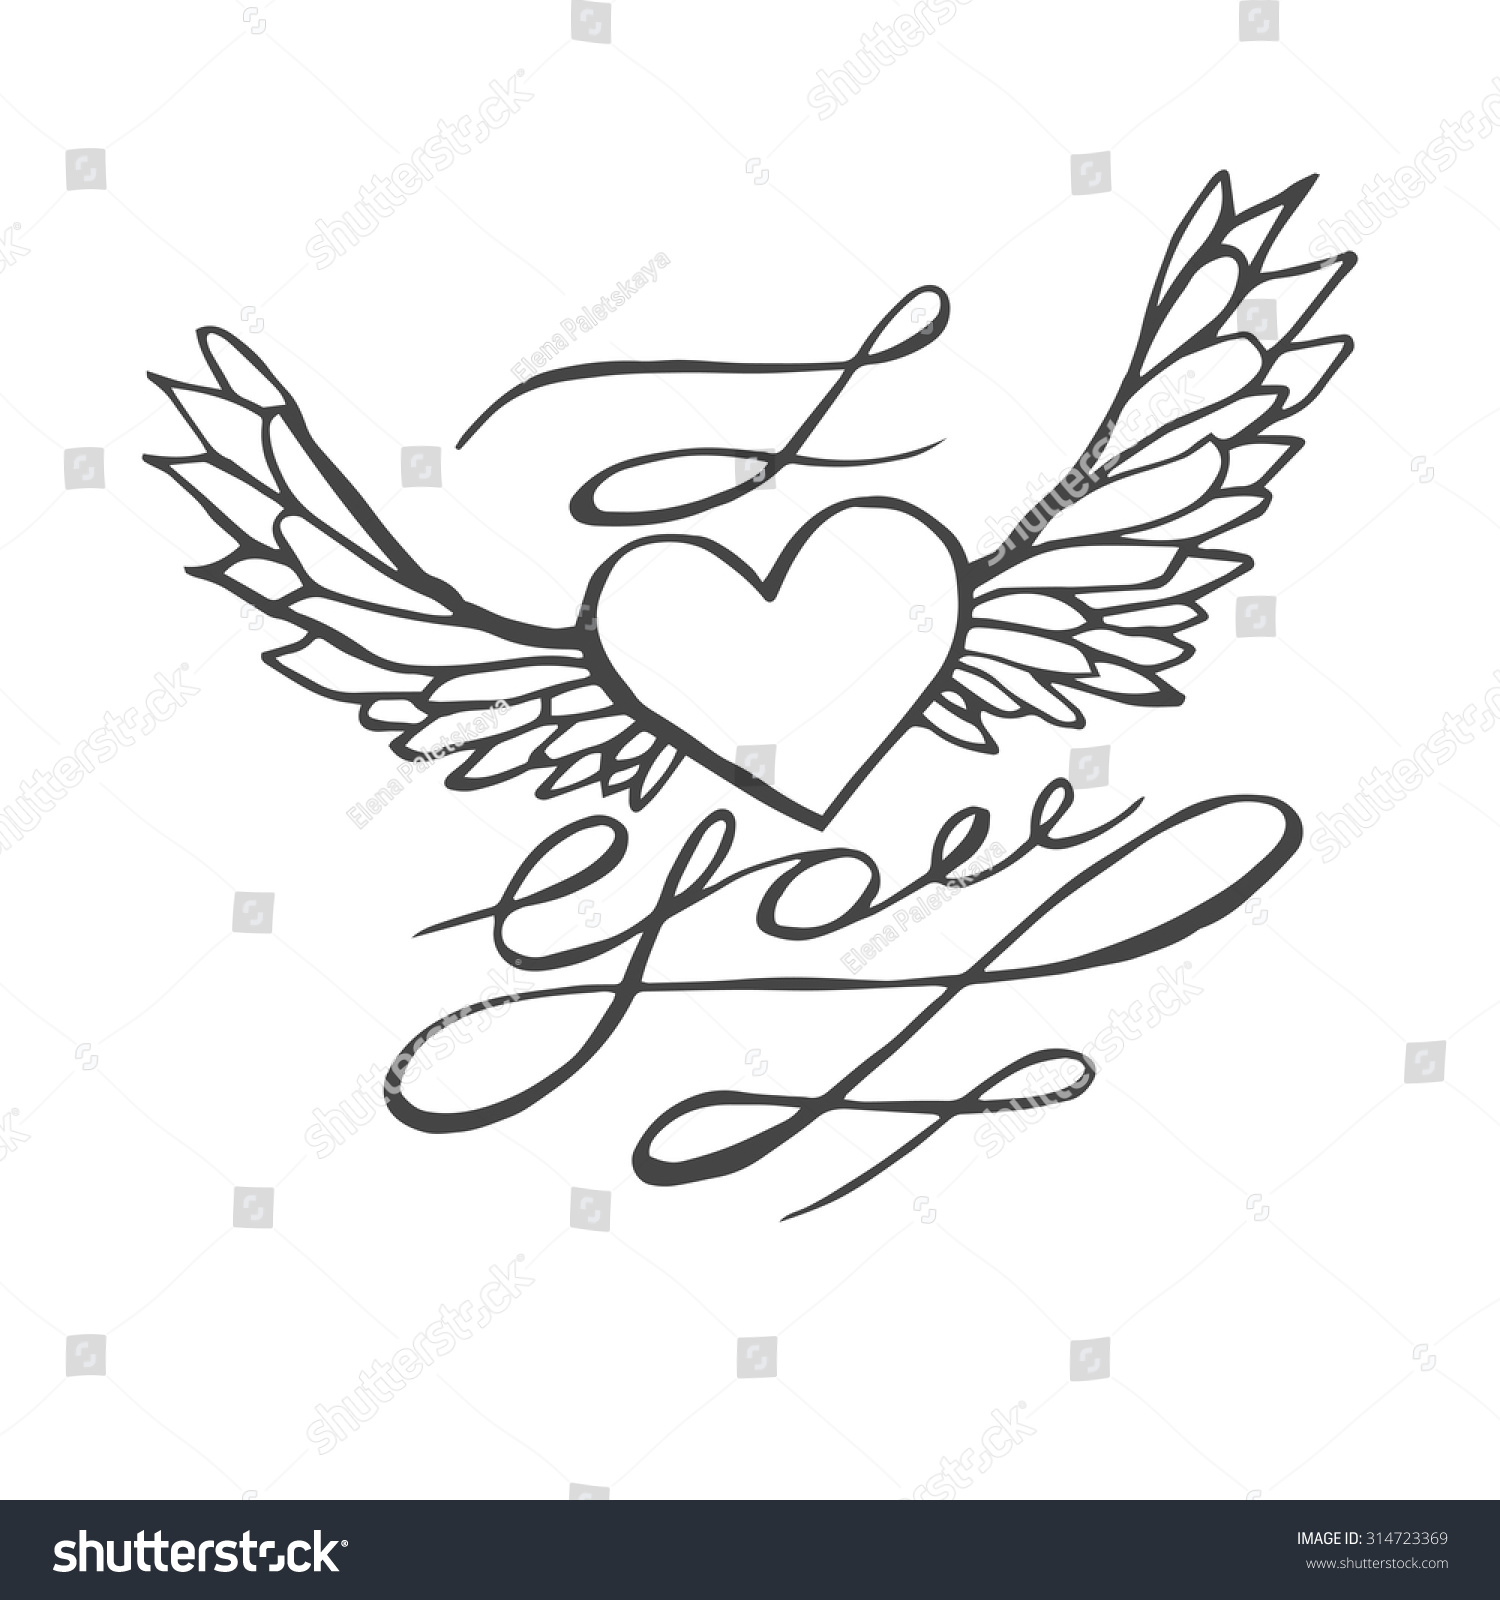 1500x1600 Gallery Romantic Heart Drawings,